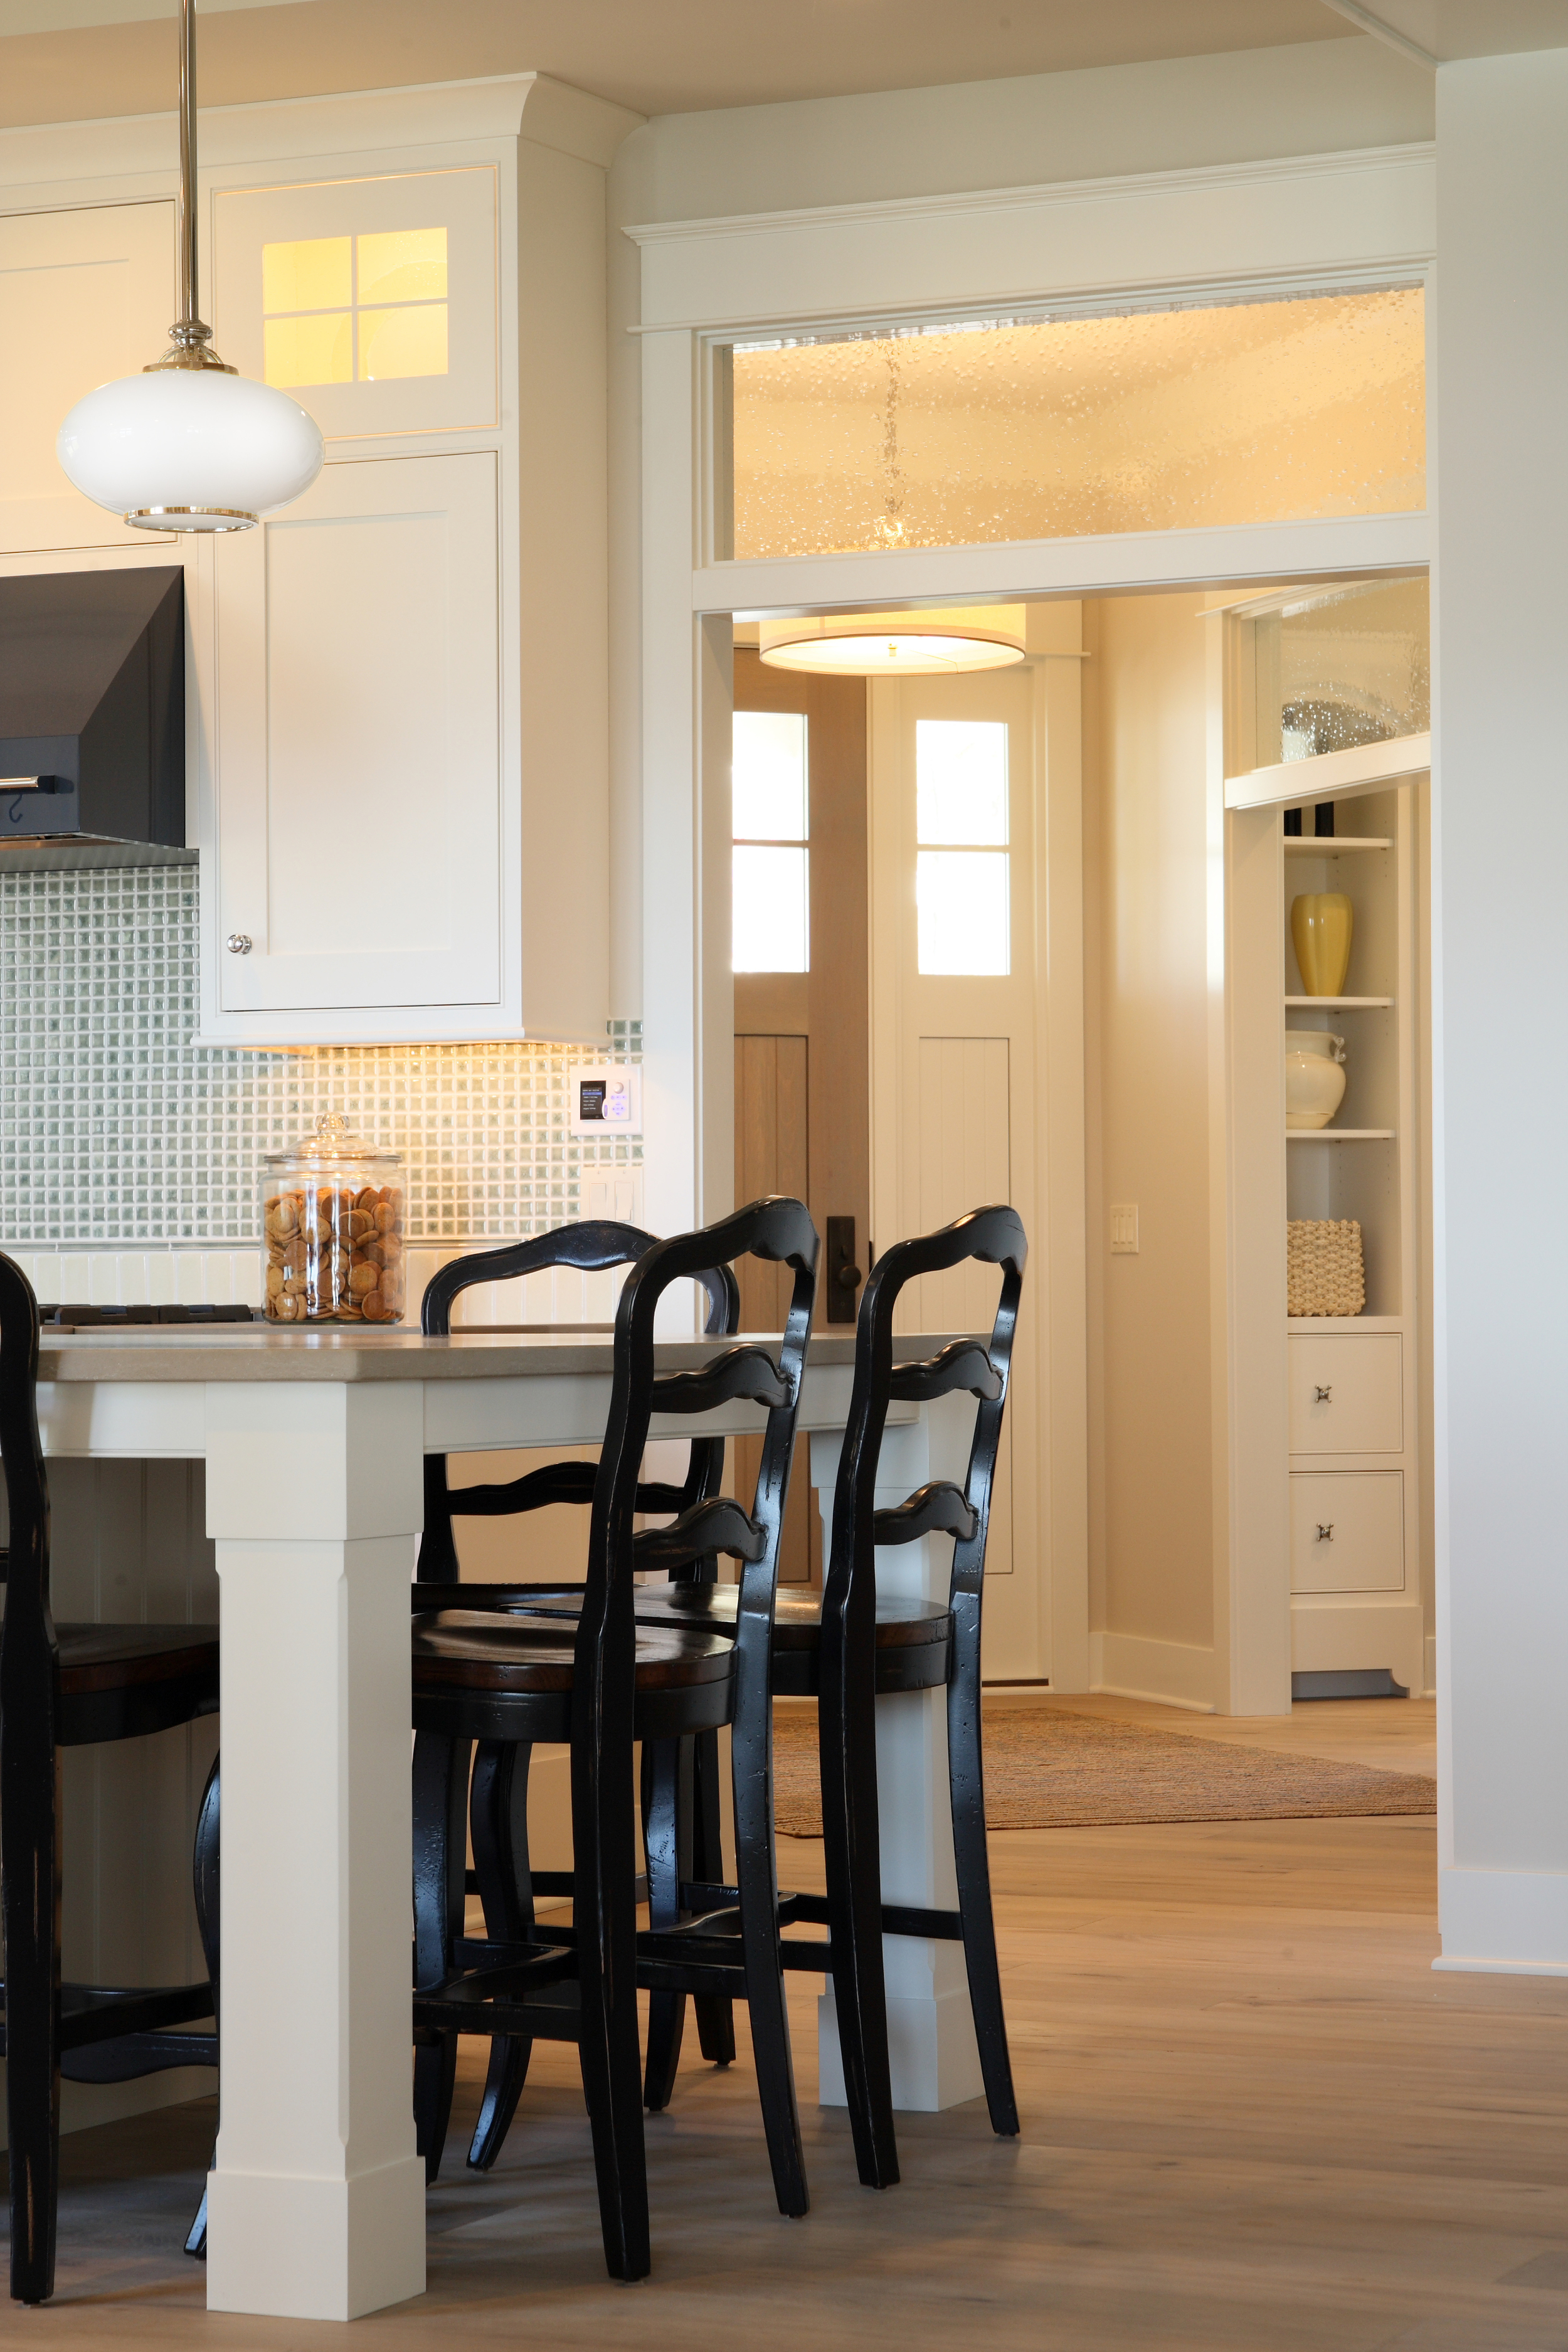 Design Home 1025.jpg